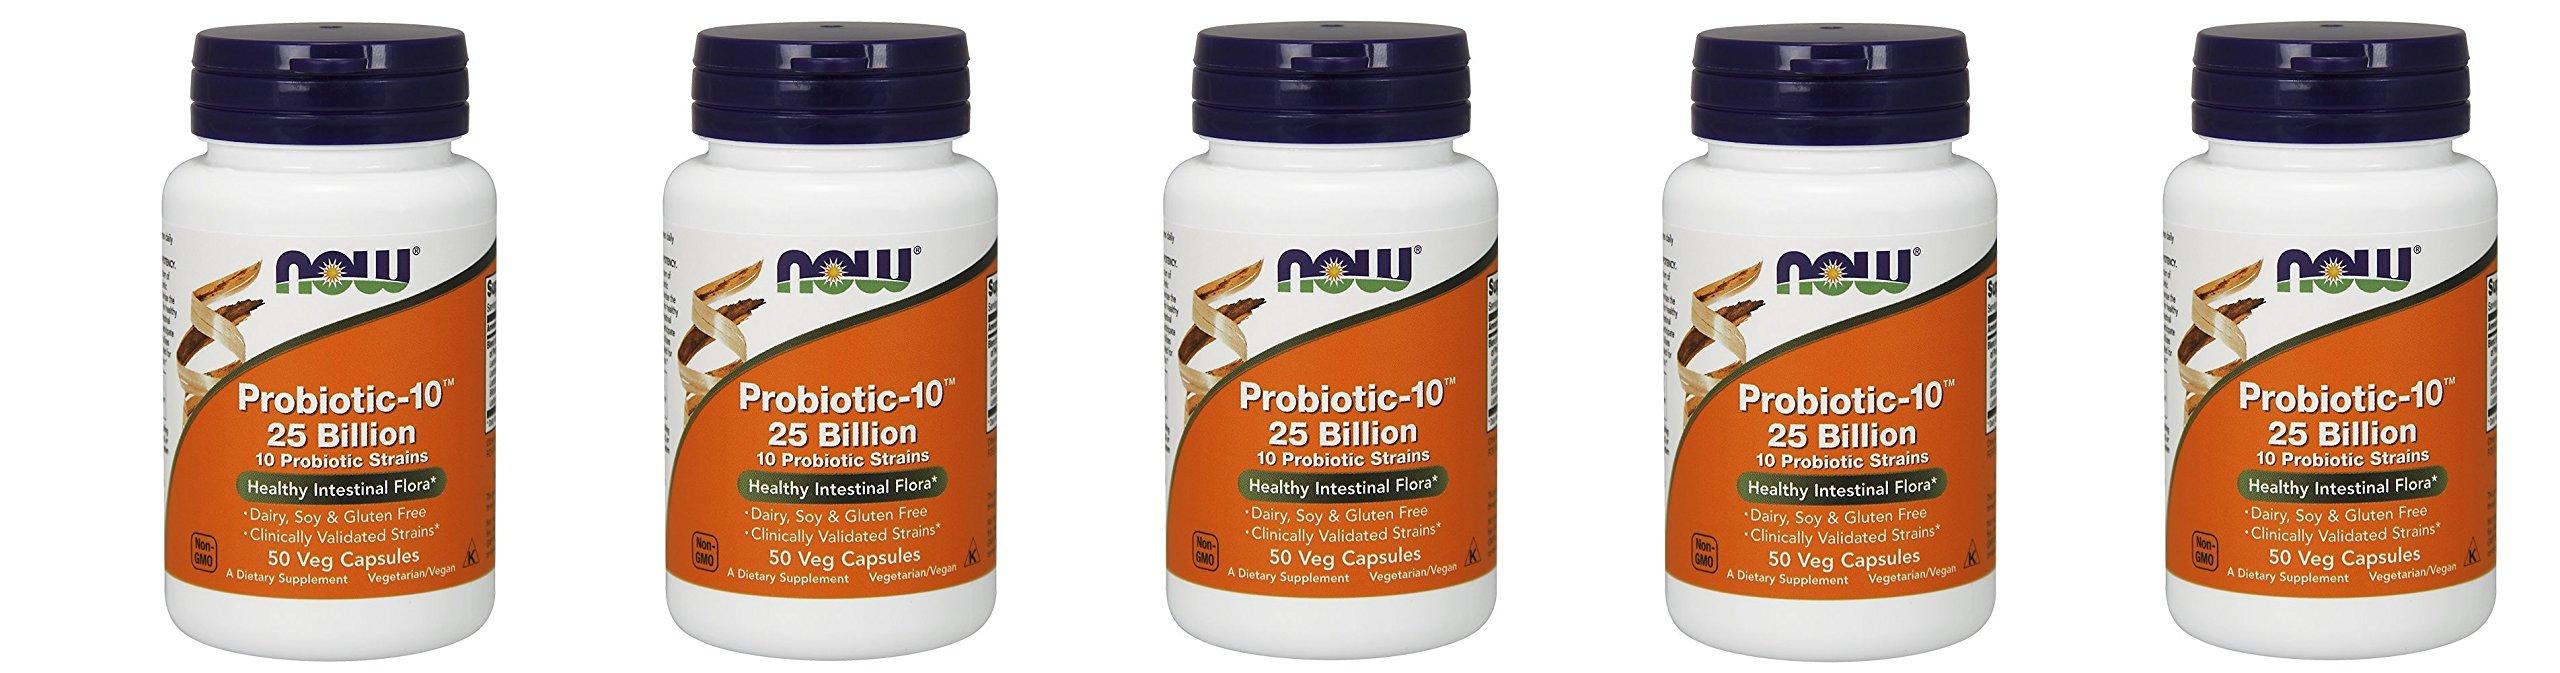 NOW Probiotic-10 25 Billion 250